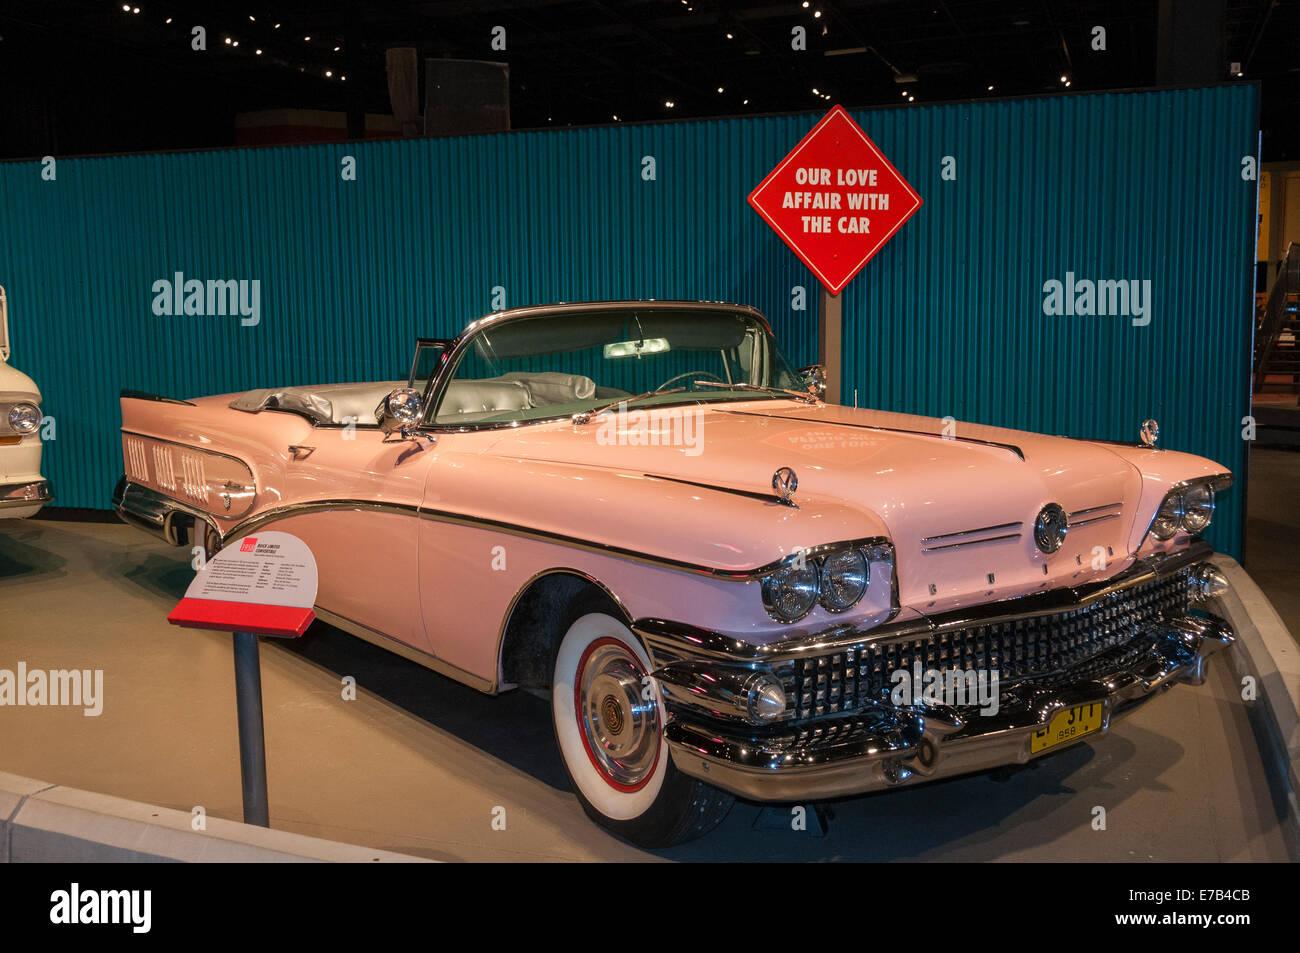 Elk203-5684 Canada, Alberta, Wetaskiwin, Reynolds-Alberta Museum, vintage automobile - Stock Image